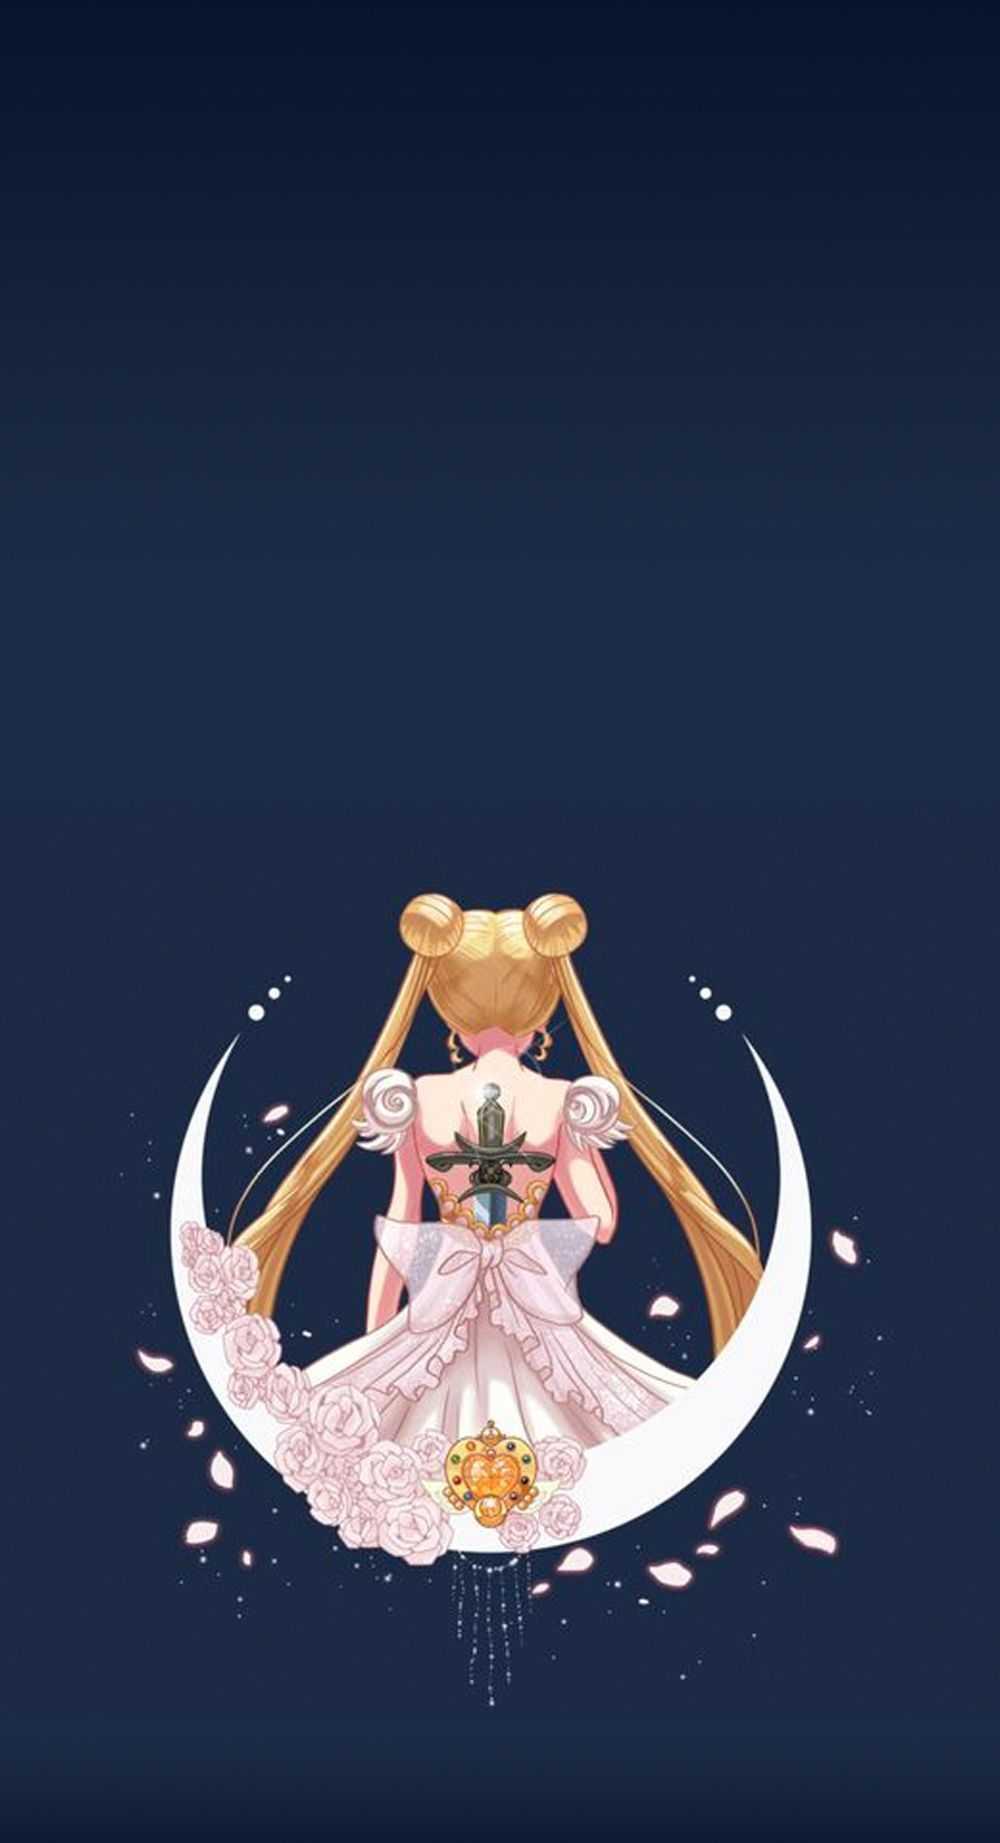 HD Sailor Moon Wallpaper   WhatsPaper